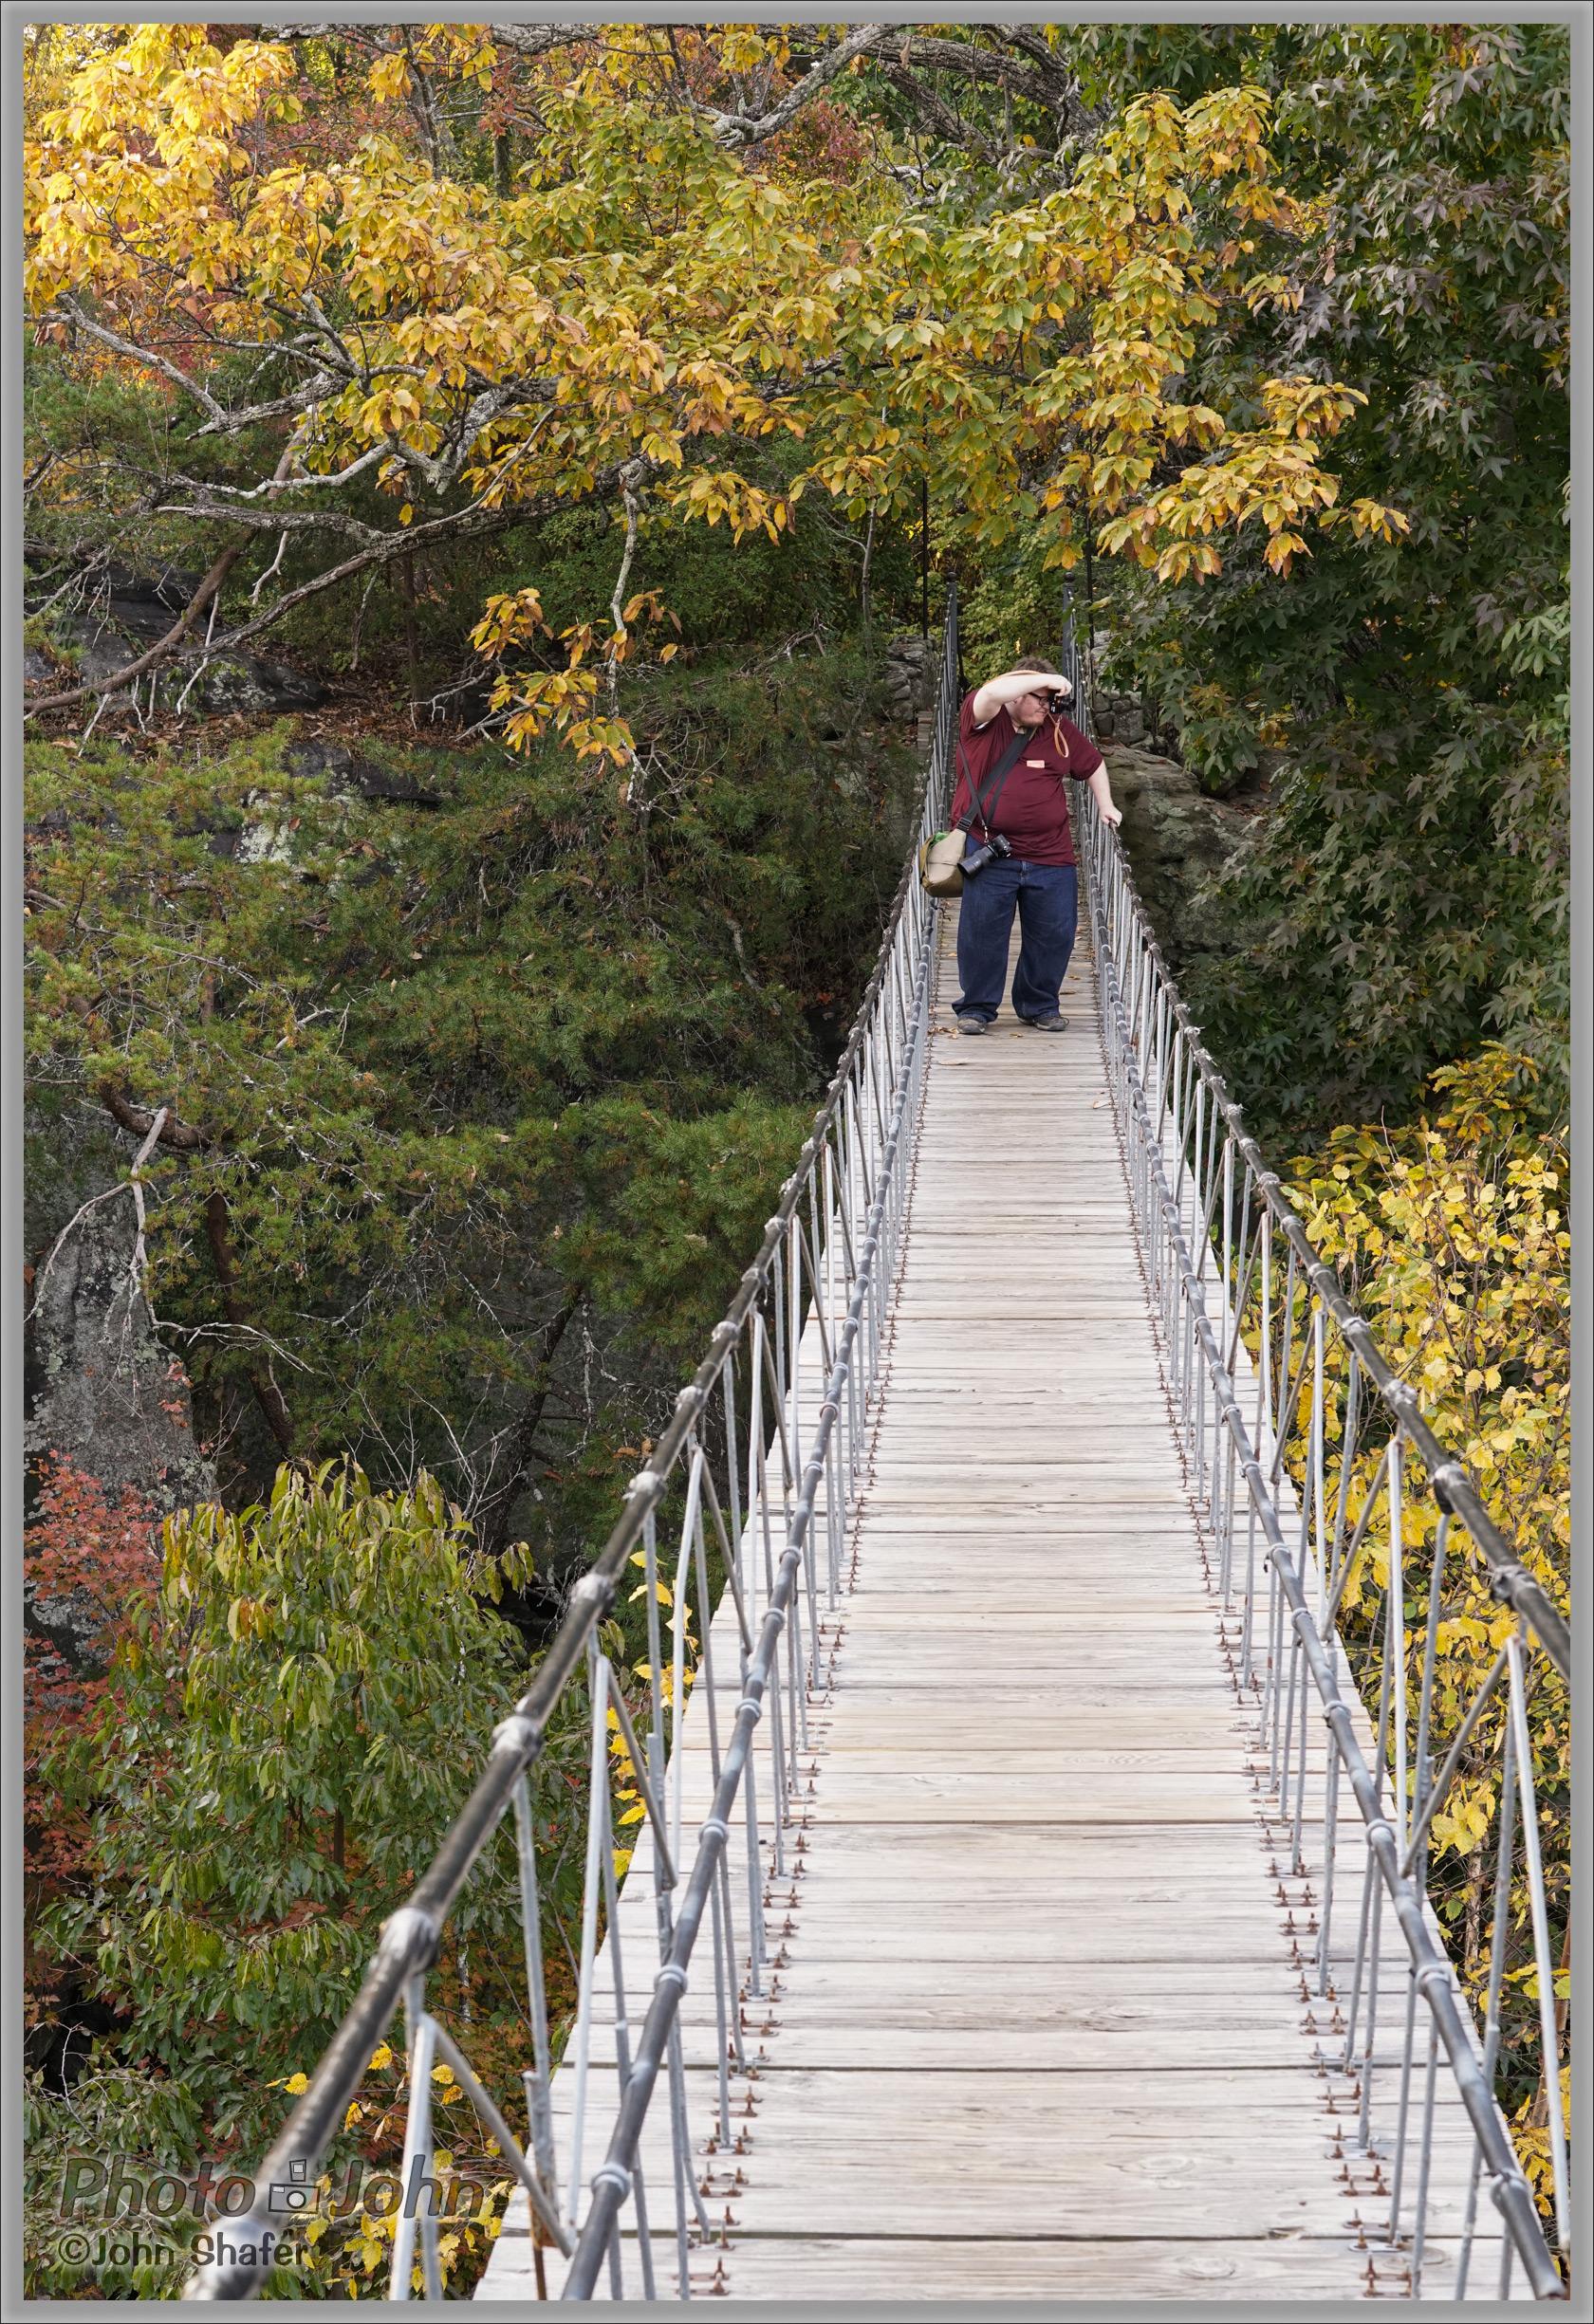 Hanging Bridge - Rock City, Georgia - Sony Alpha A7R